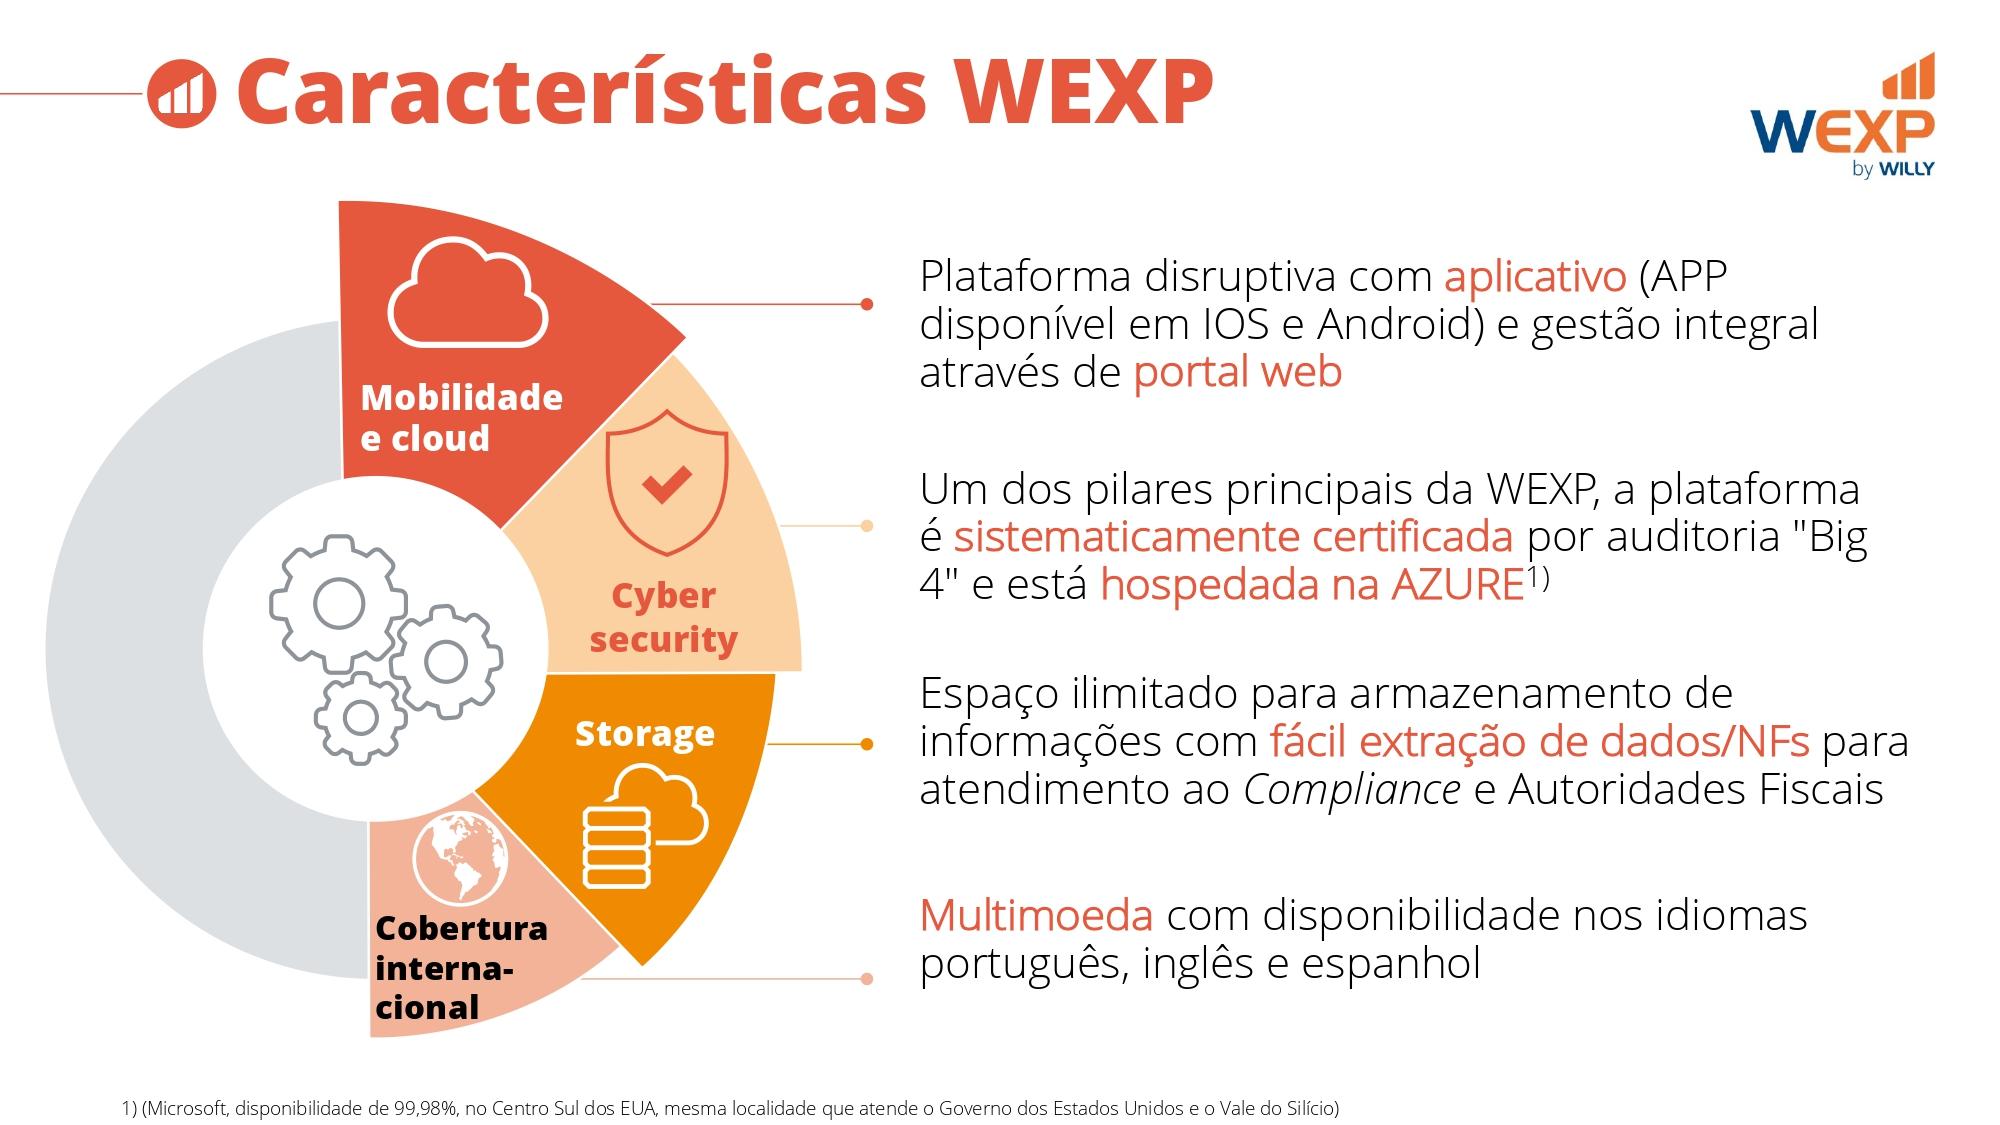 WEXP_Institucional_20190416_page-0006